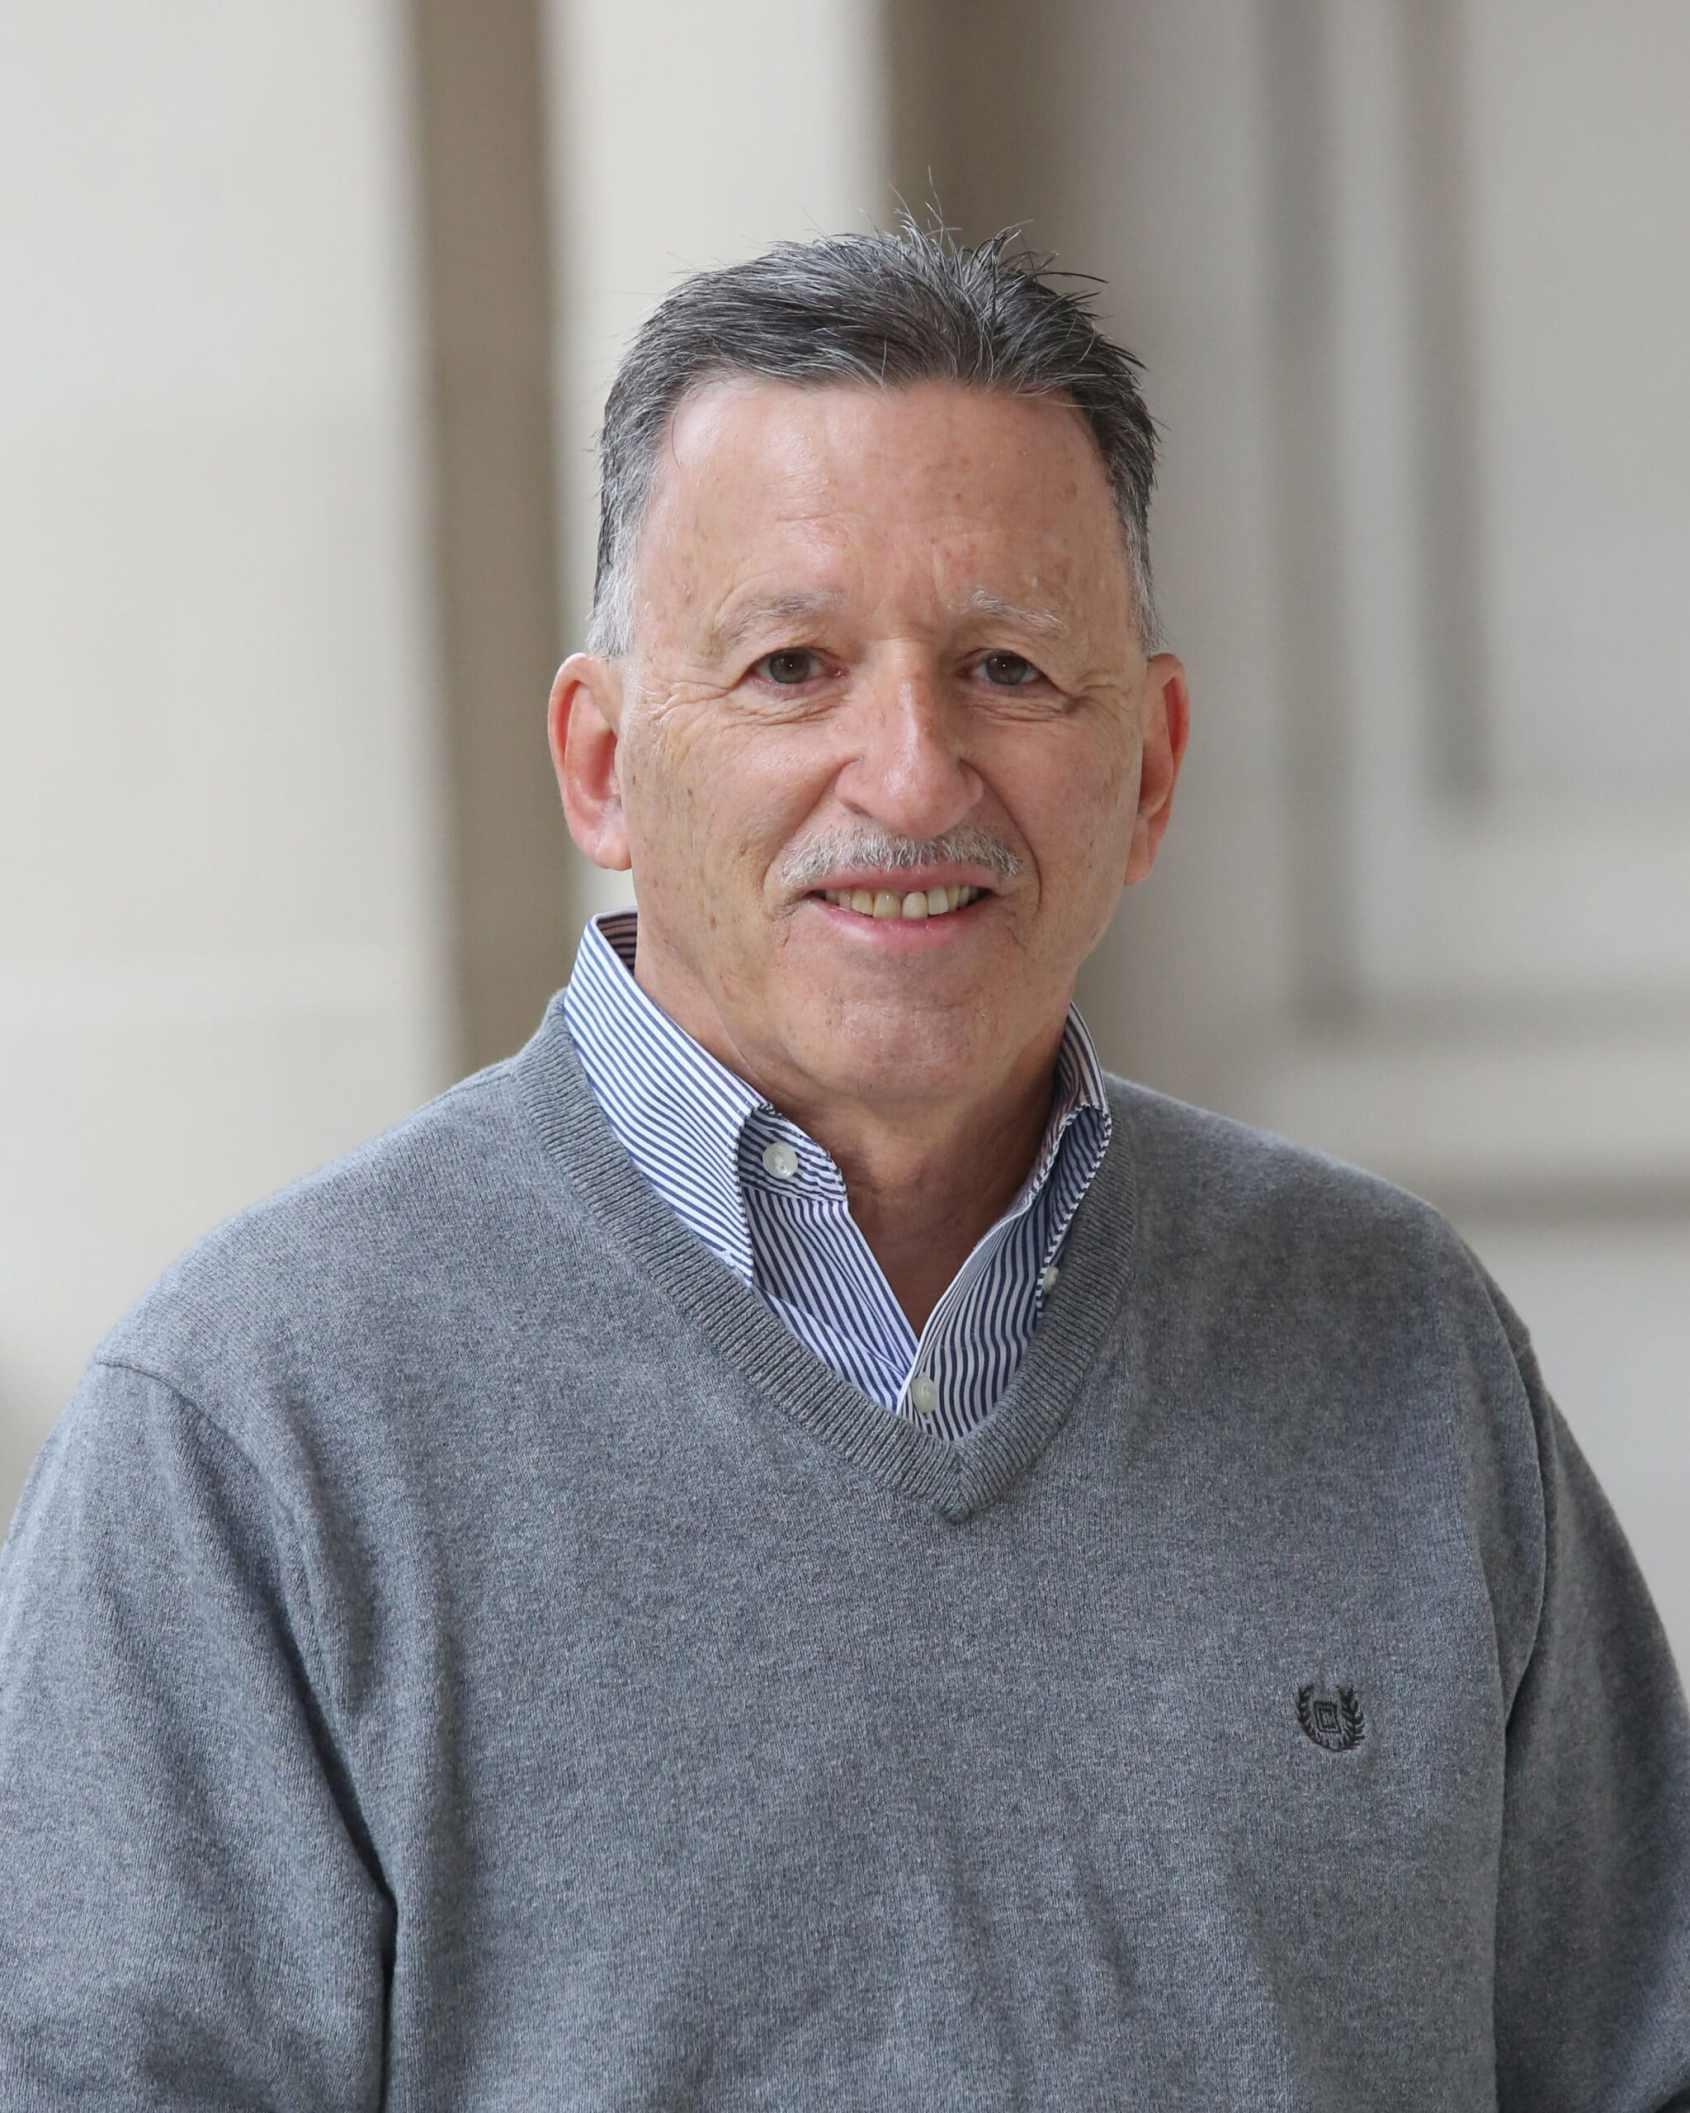 Portrait picture of Mayor Rick Hall